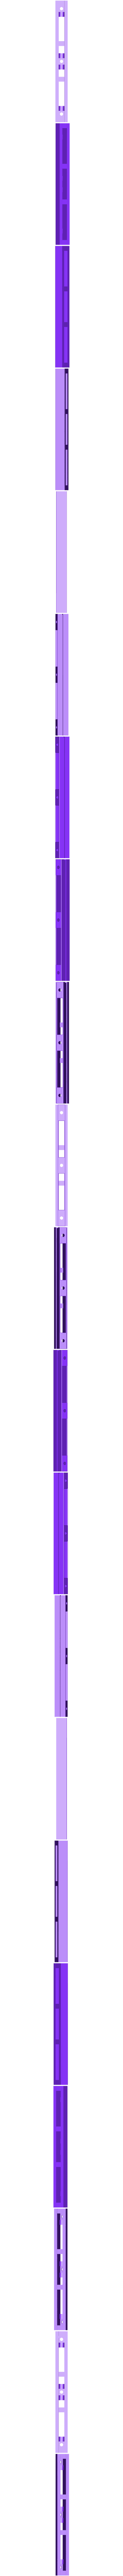 support glissieres suspendu double.STL Download free STL file Hanging storage drawers • 3D printer model, Ni-no